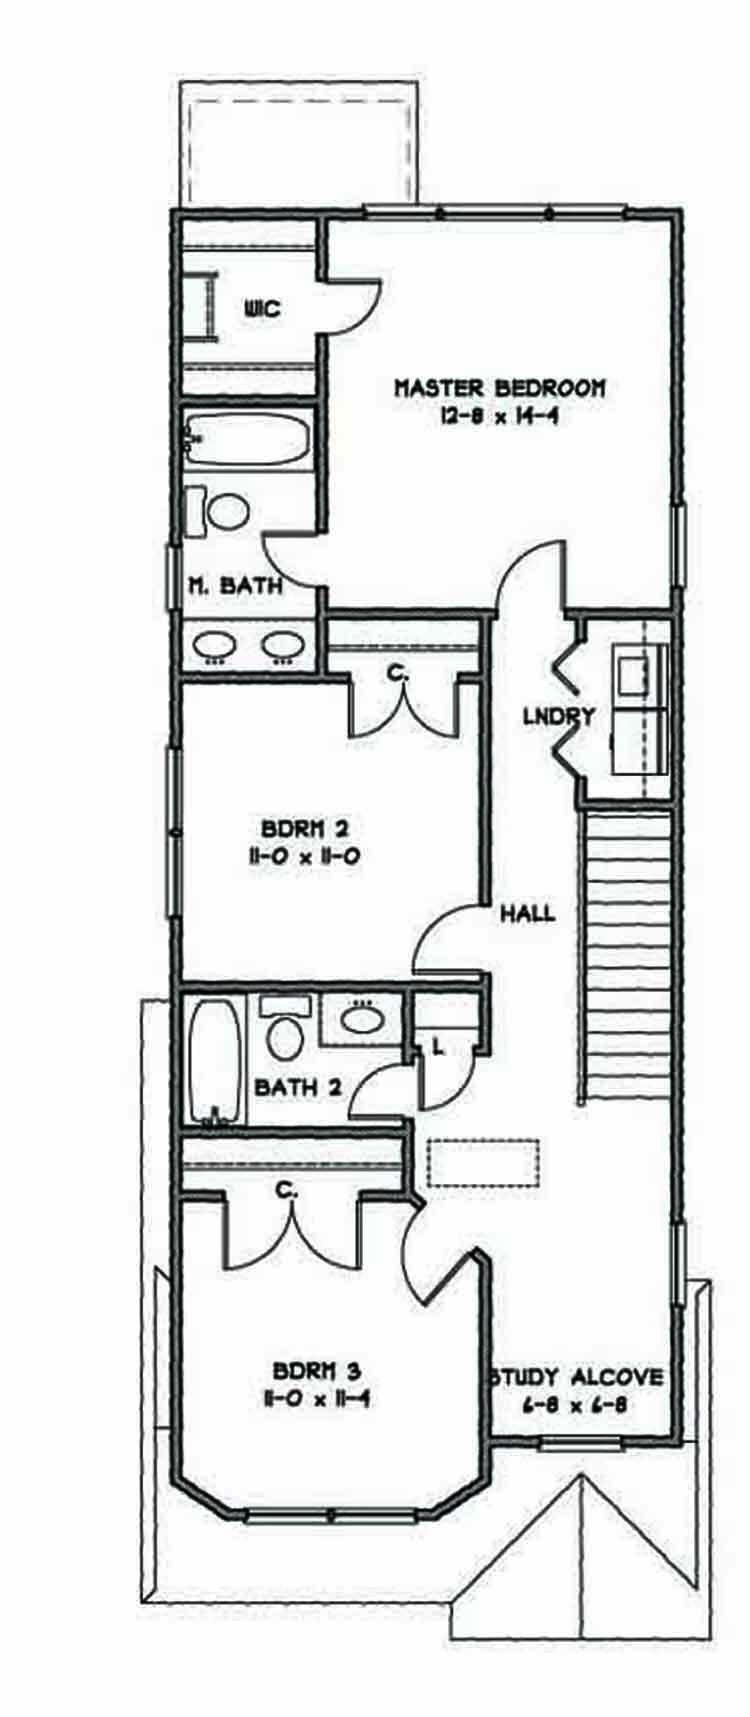 Shea-Terrace-2nd-floor1 Painted Lady House Floor Plan on small blue floor plan, marine blue floor plan, viceroy floor plan, map floor plan, monarch floor plan, mr selfridge floor plan, kinky boots floor plan, family floor plan,